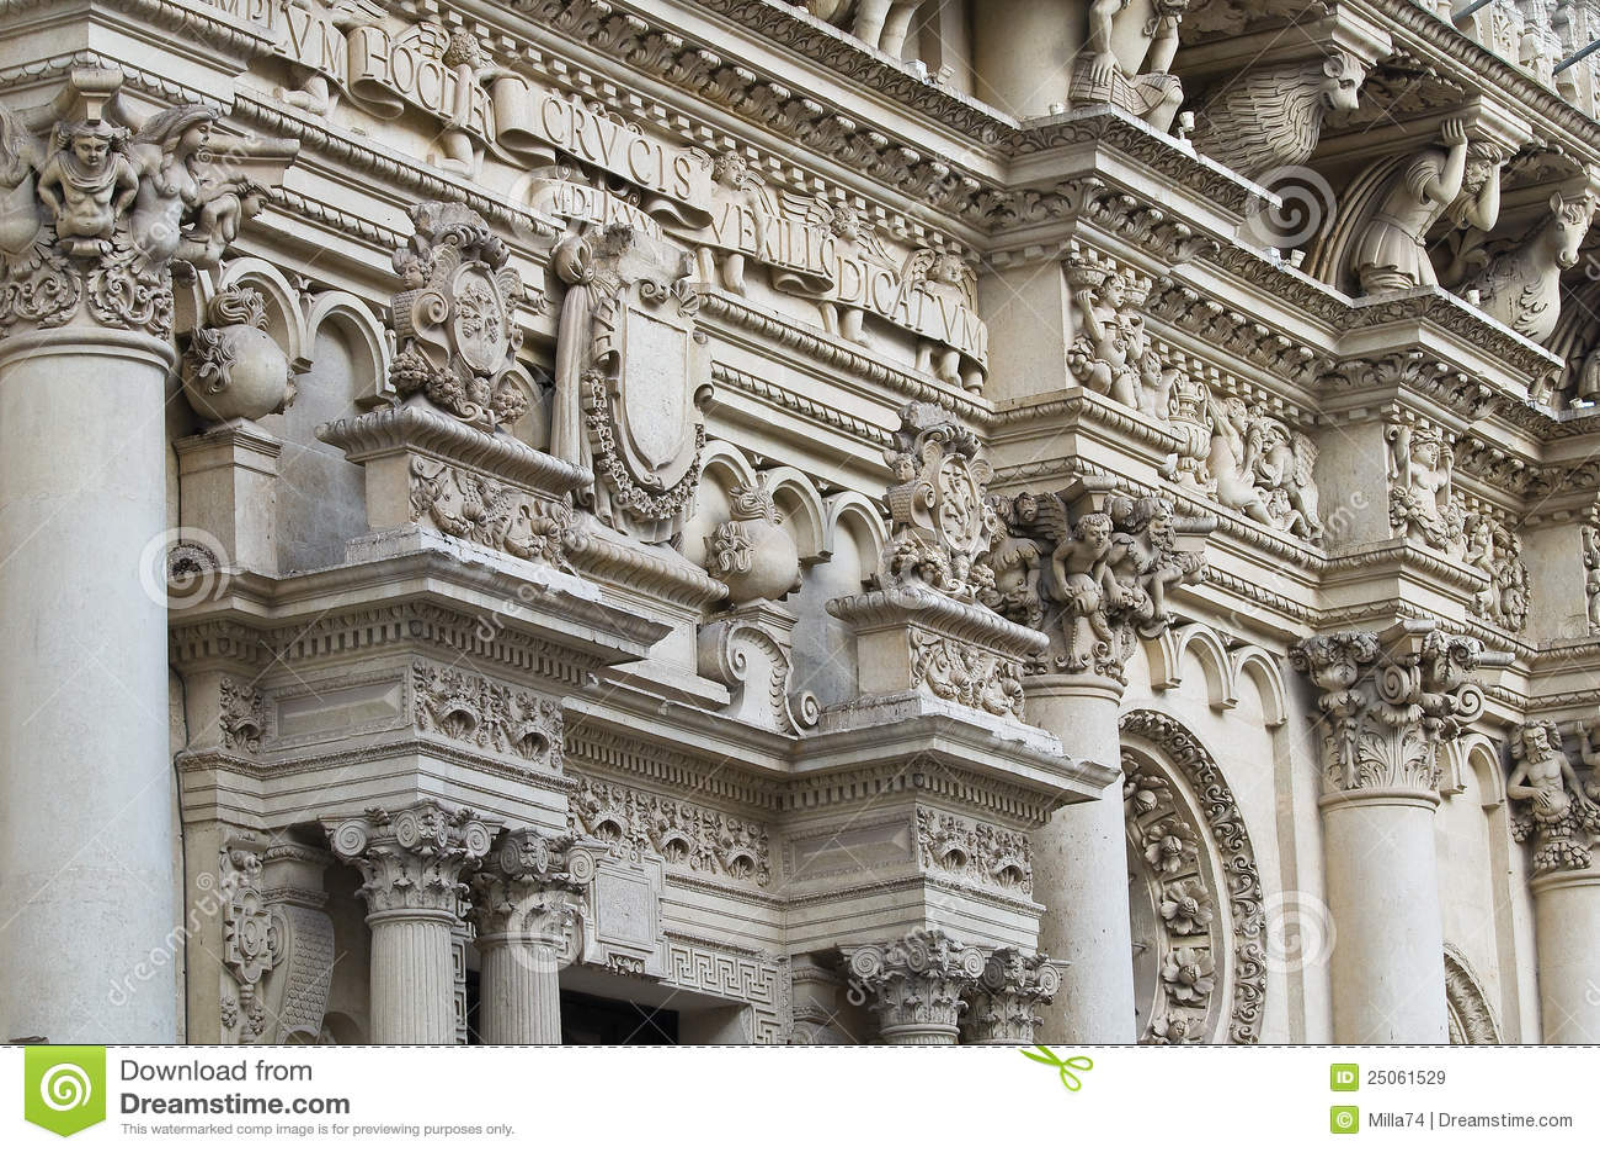 Basílica de Santa Croce. Lecce. Puglia. Italy.